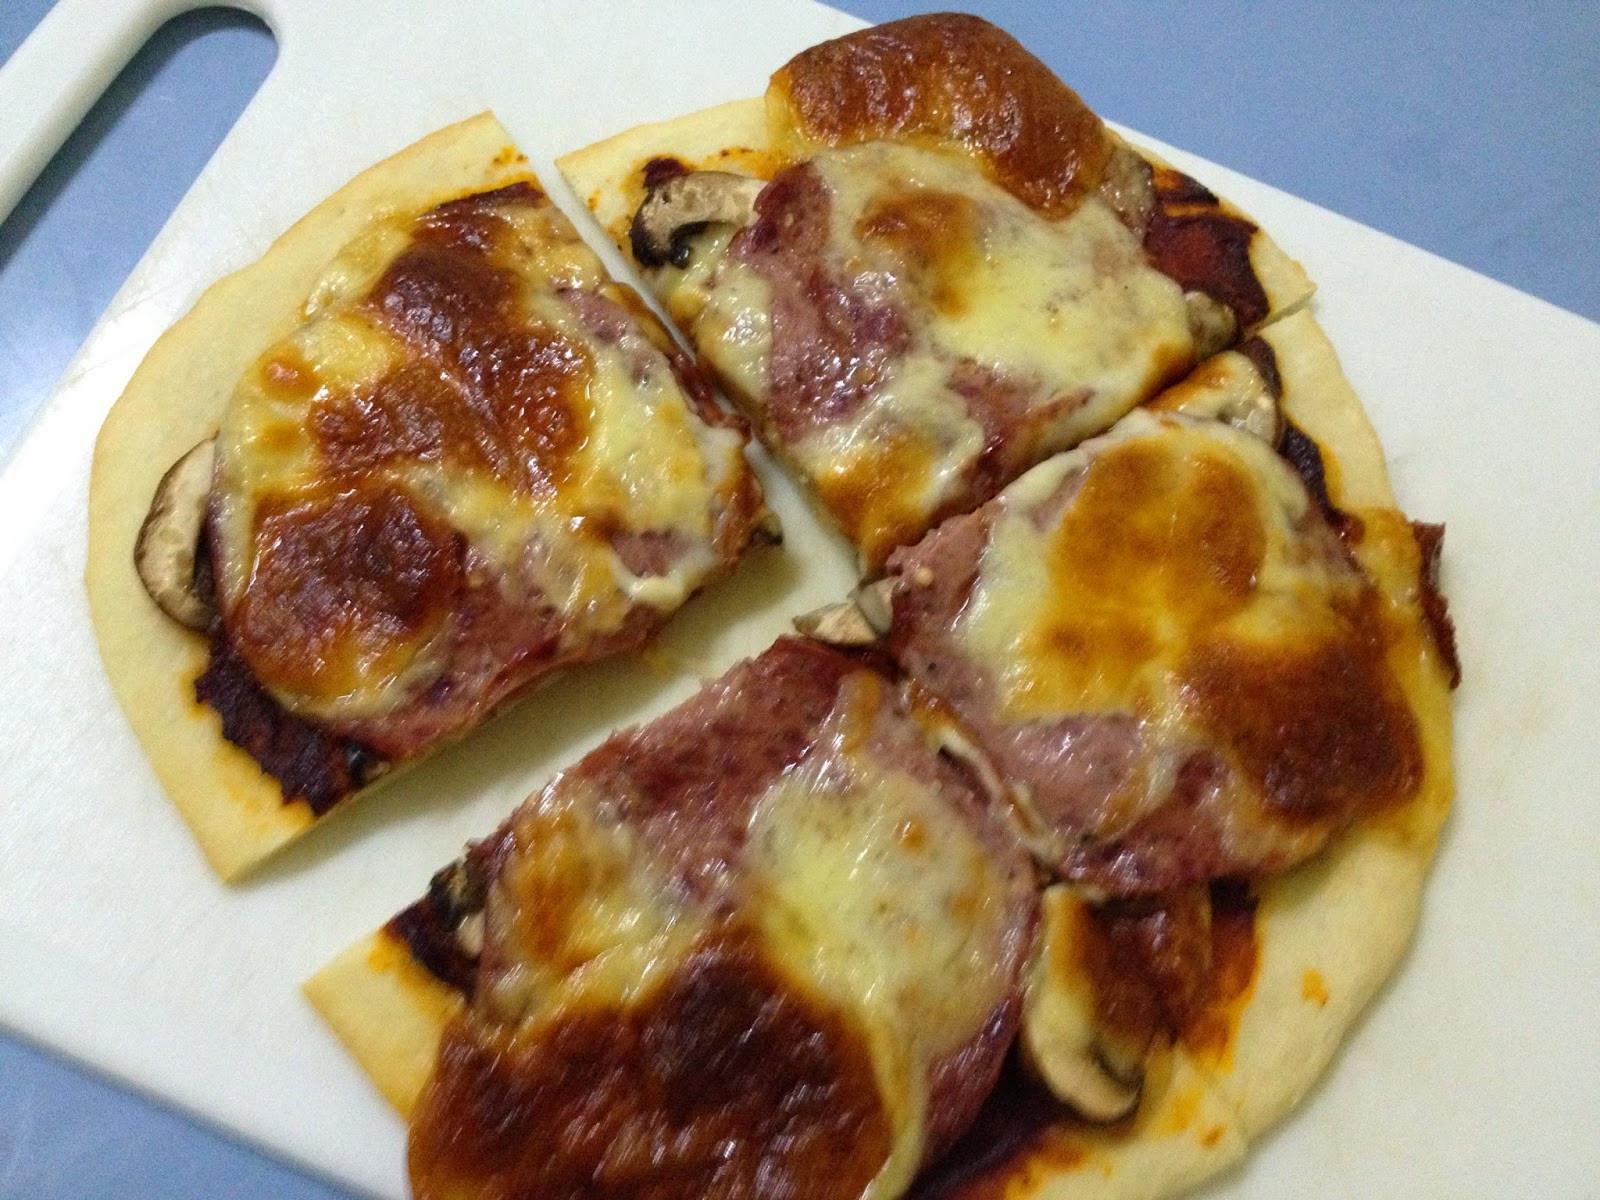 Food Processor Pizza Dough  TOPSY TURVY KITCHEN ♥ Pizza Dough Using Food Processor